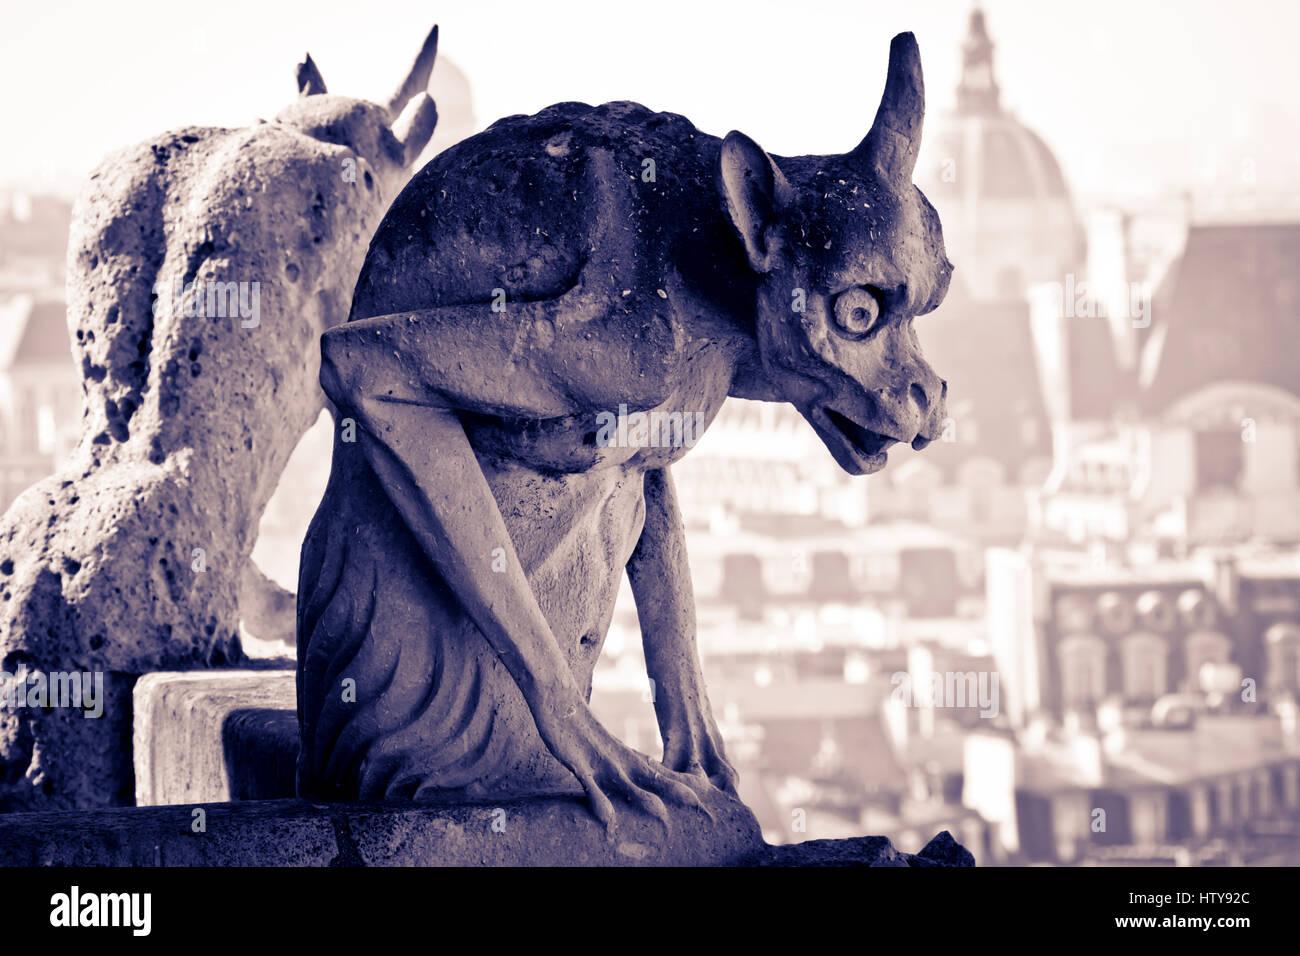 Gargoyle figure. Notre Dame Cathedral. Paris, France, Europe. - Stock Image